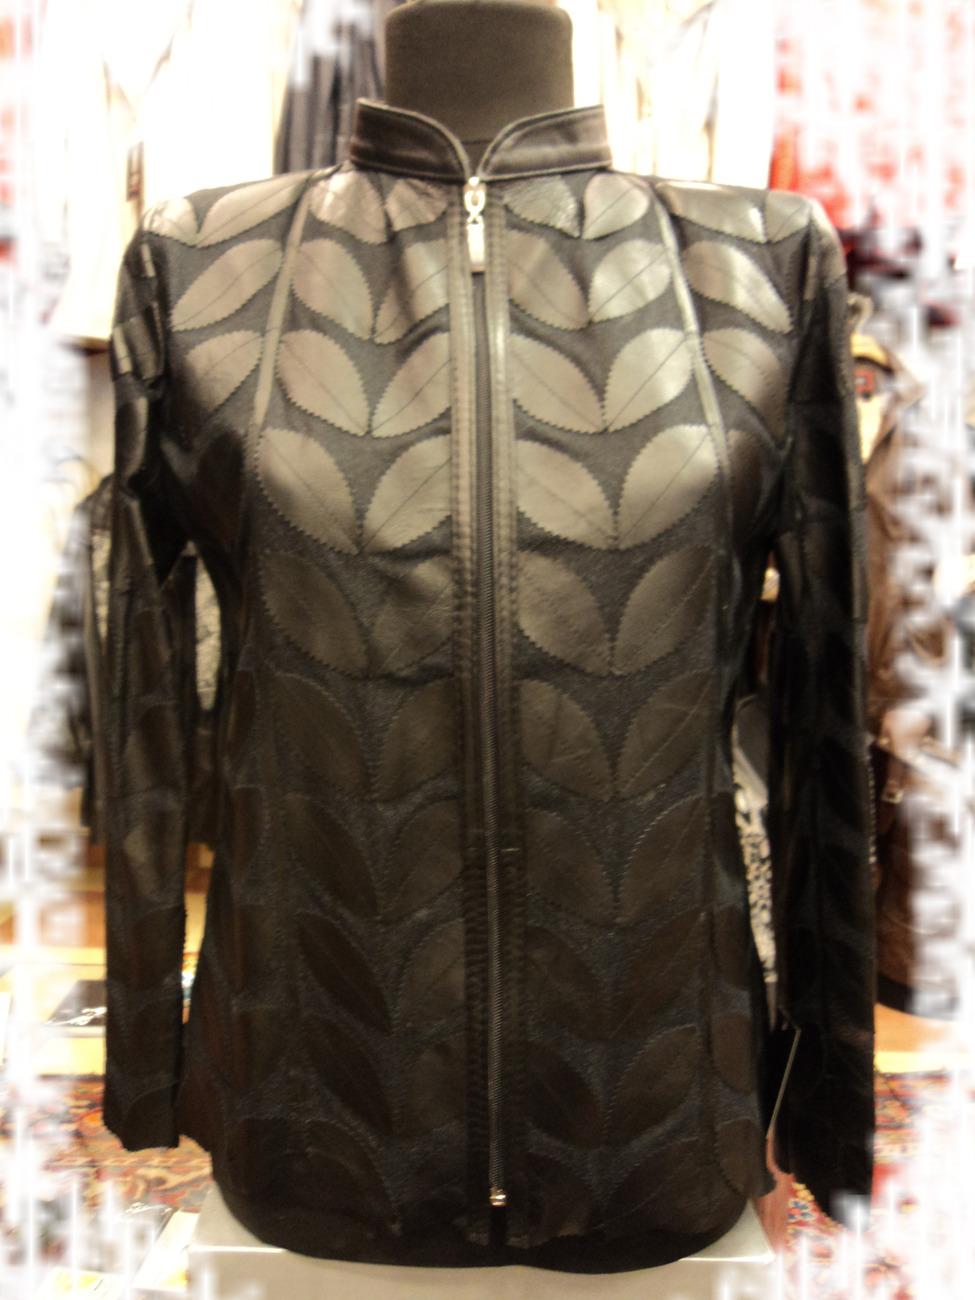 Leaf Leather Jacket